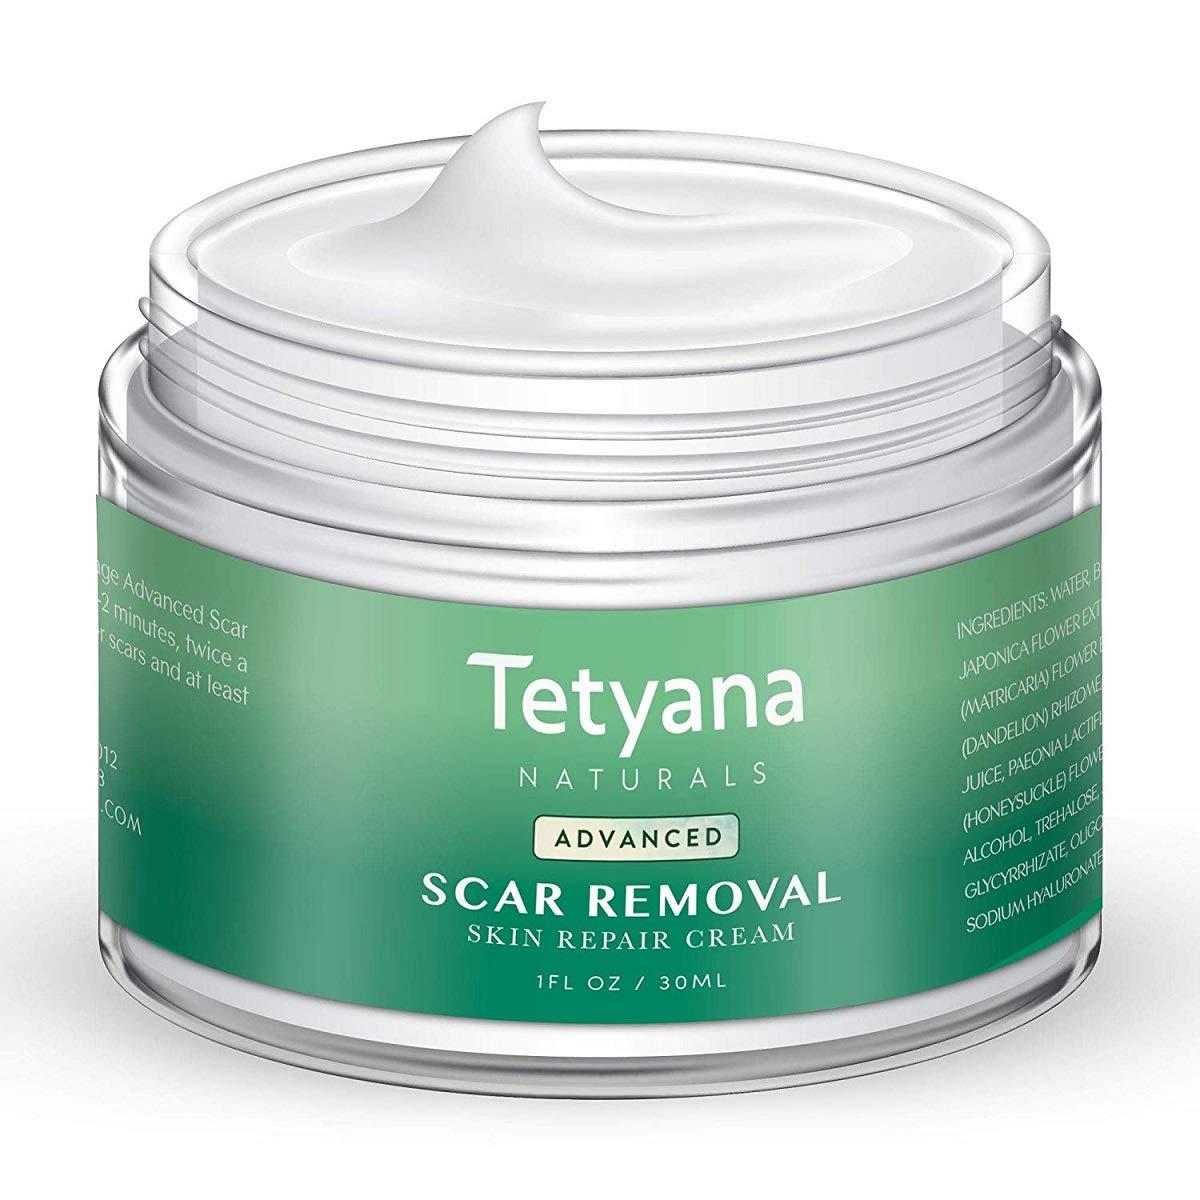 Tetyana Scar Removal Cream